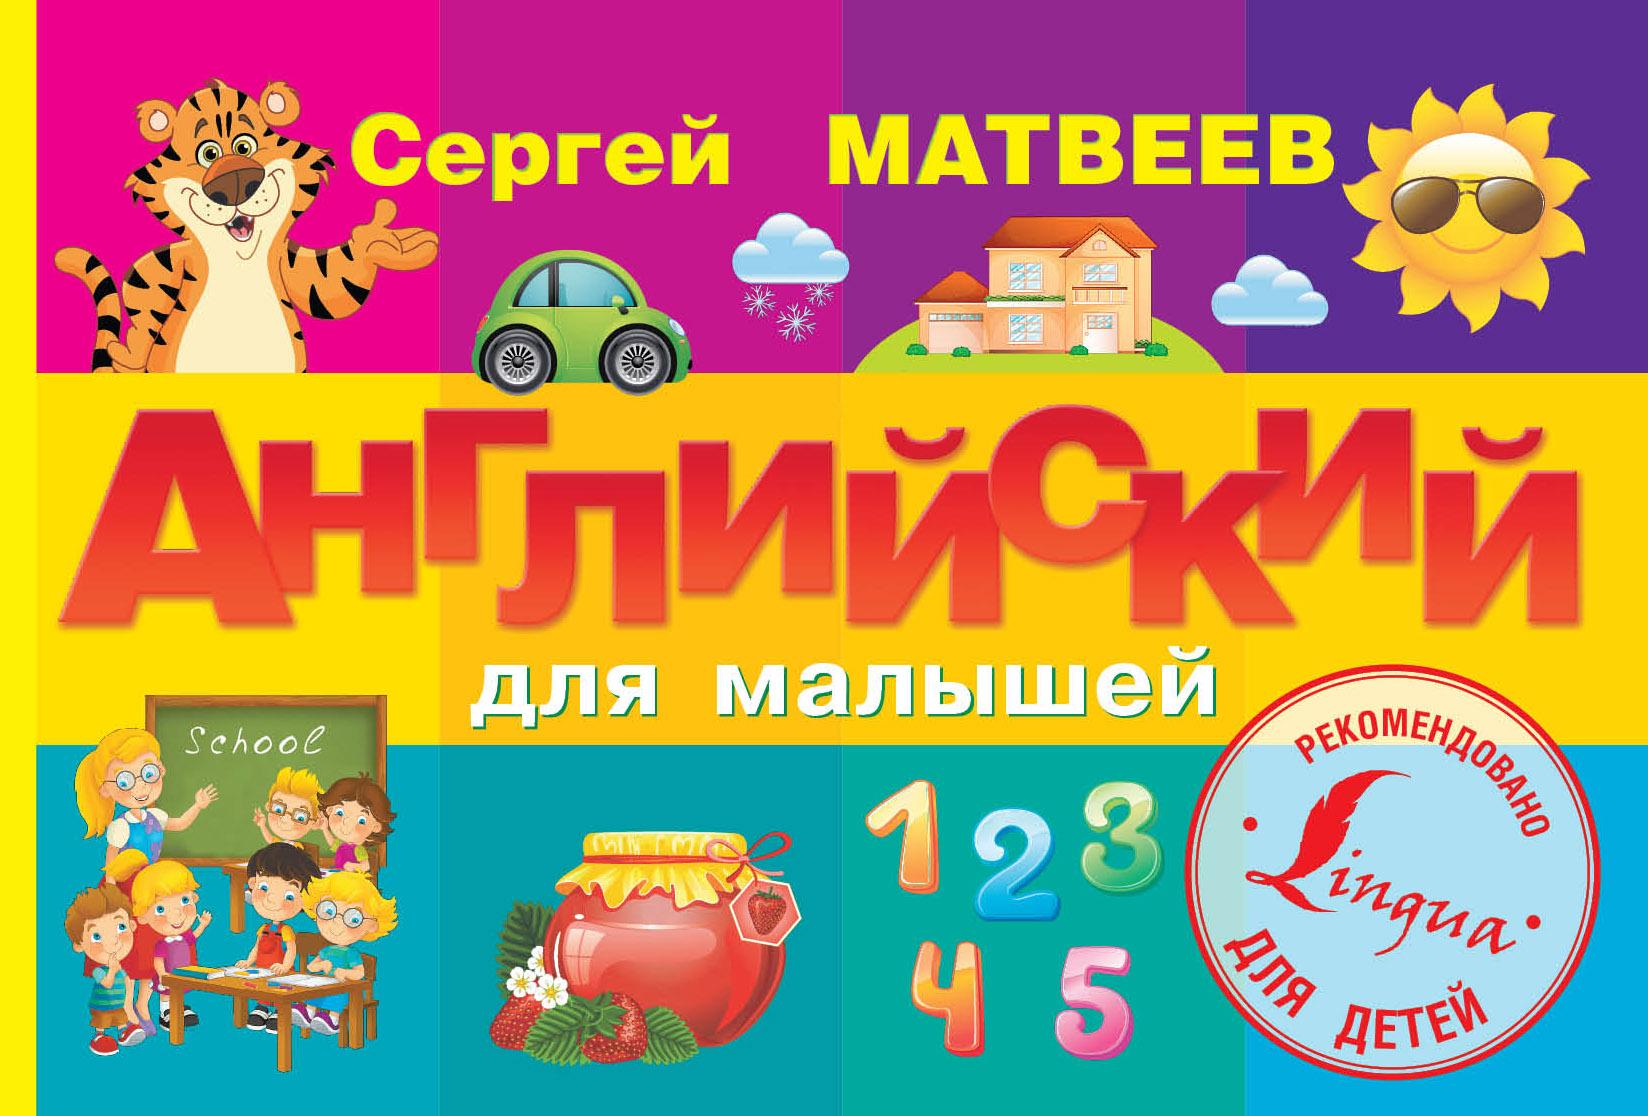 Сергей Матвеев Английский для малышей матвеев сергей александрович английский для малышей коробка